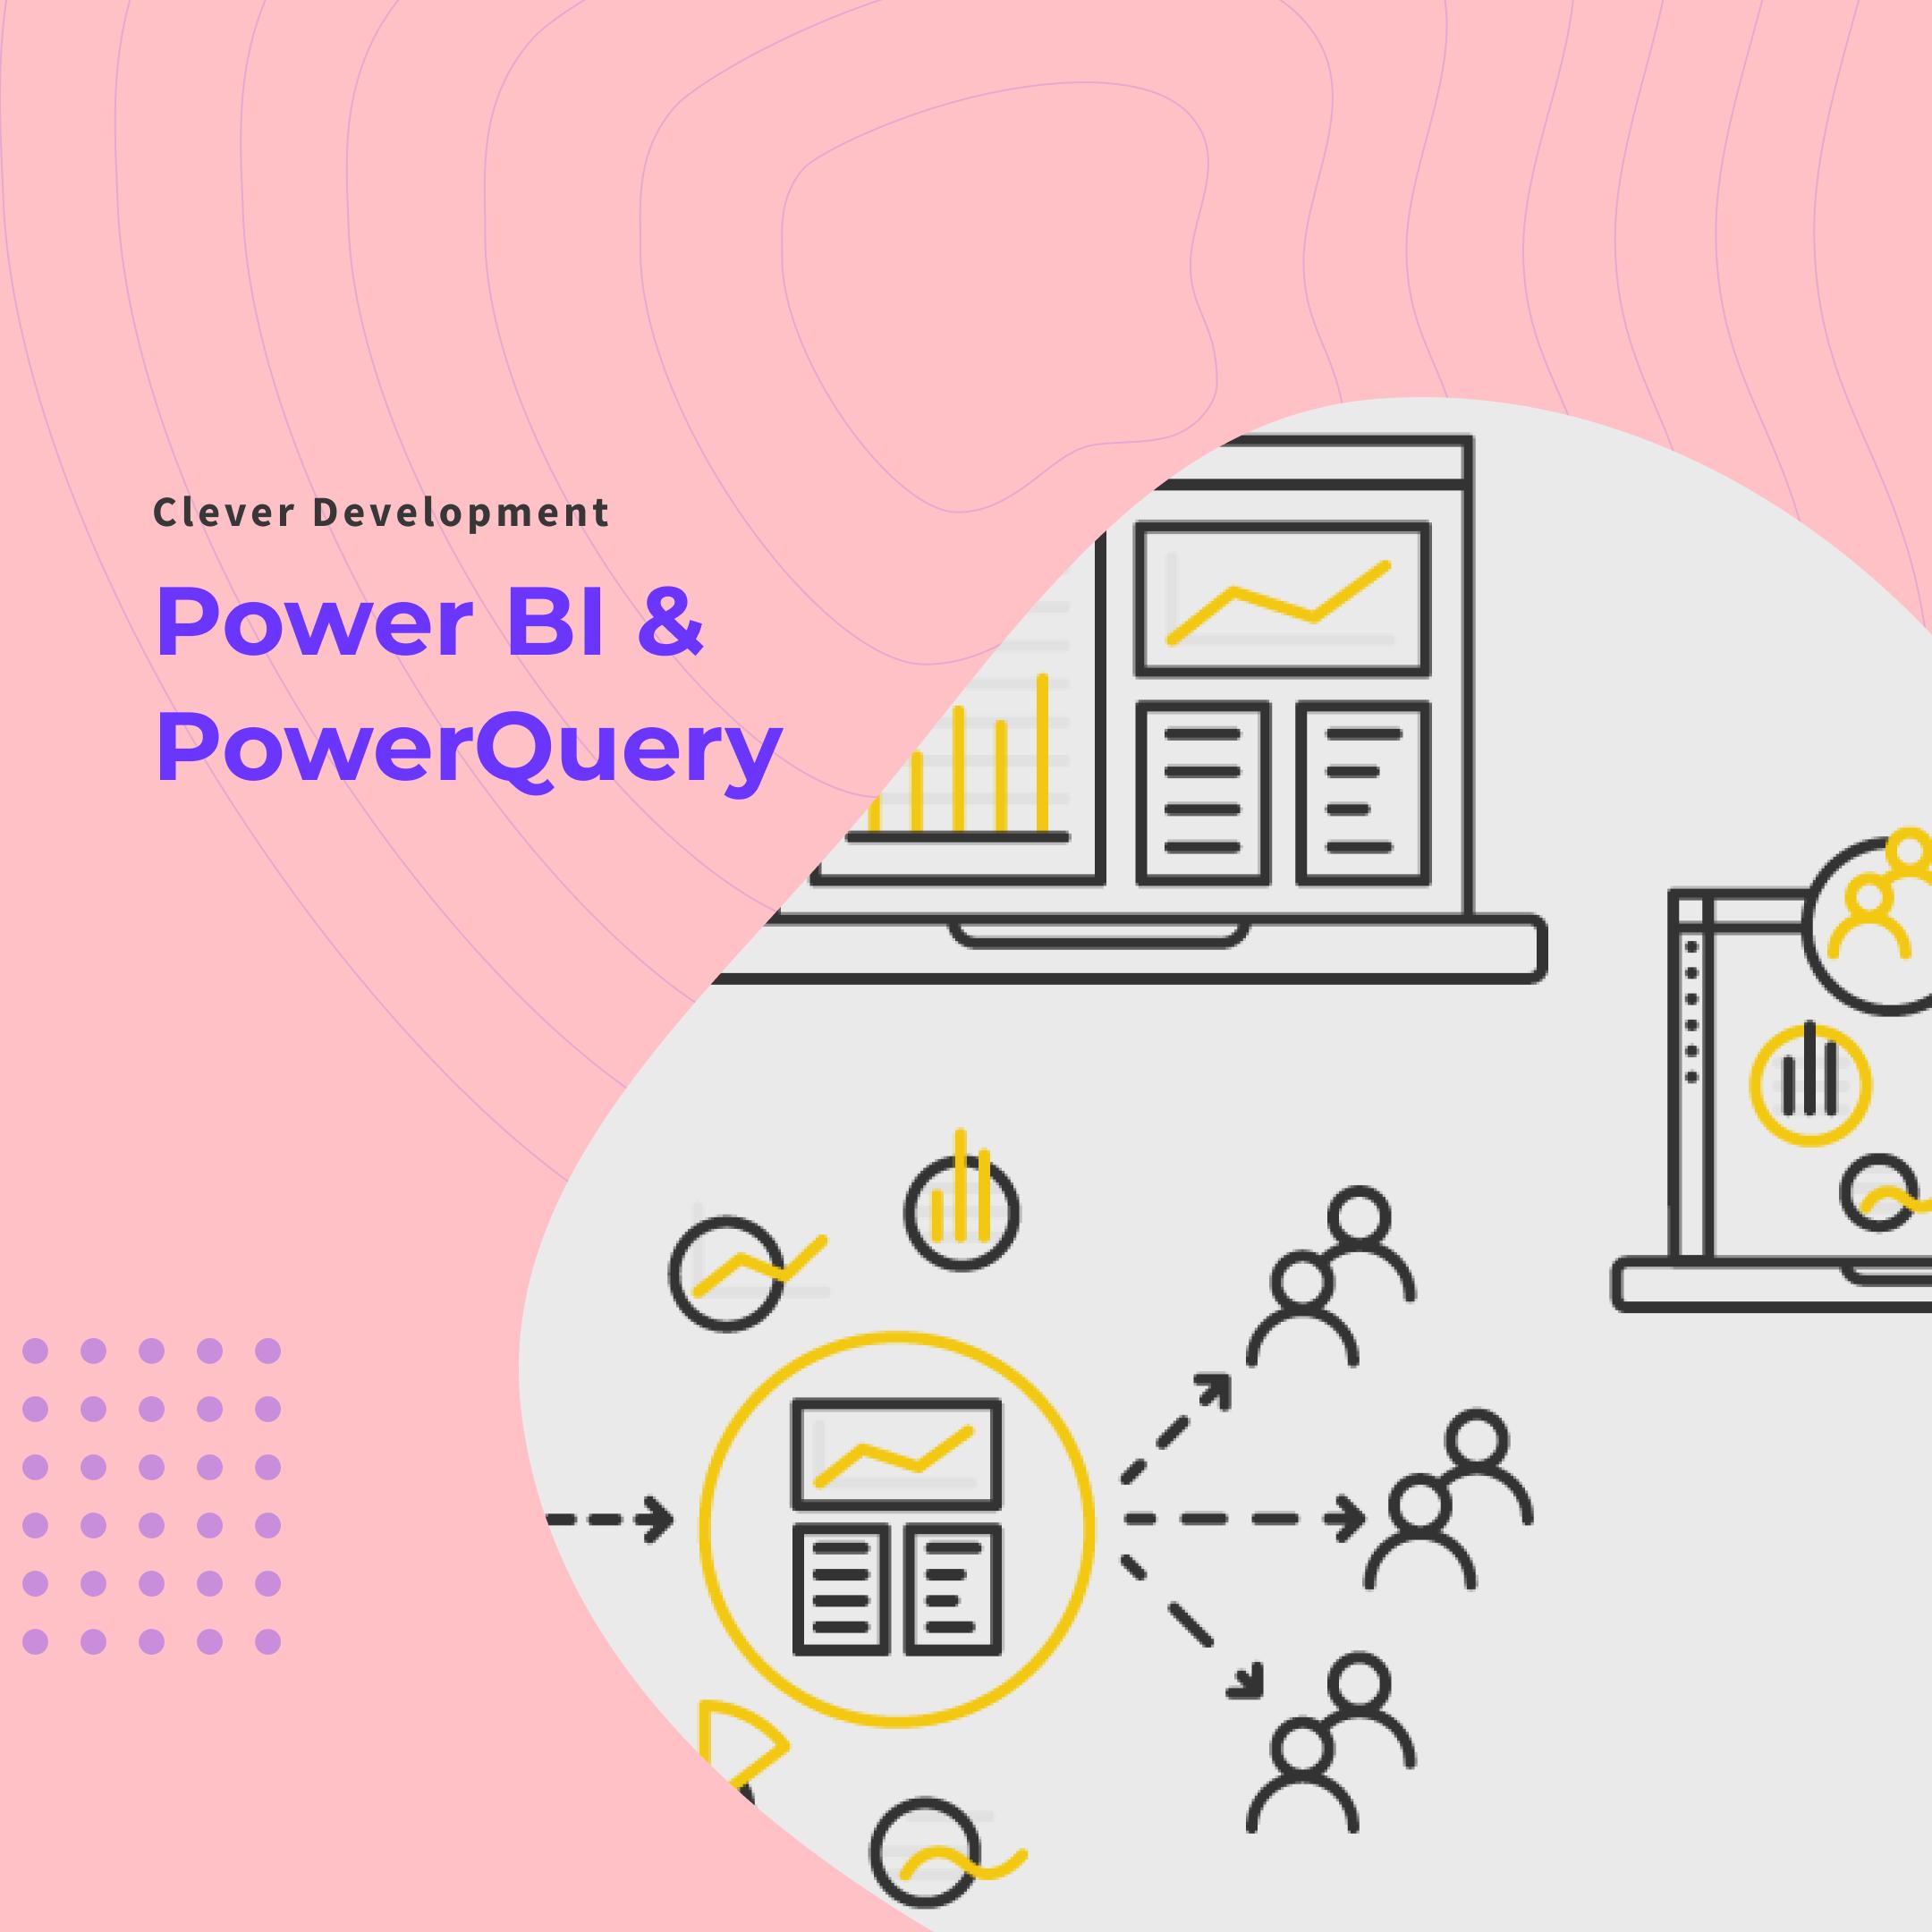 Power BI & PowerQuery